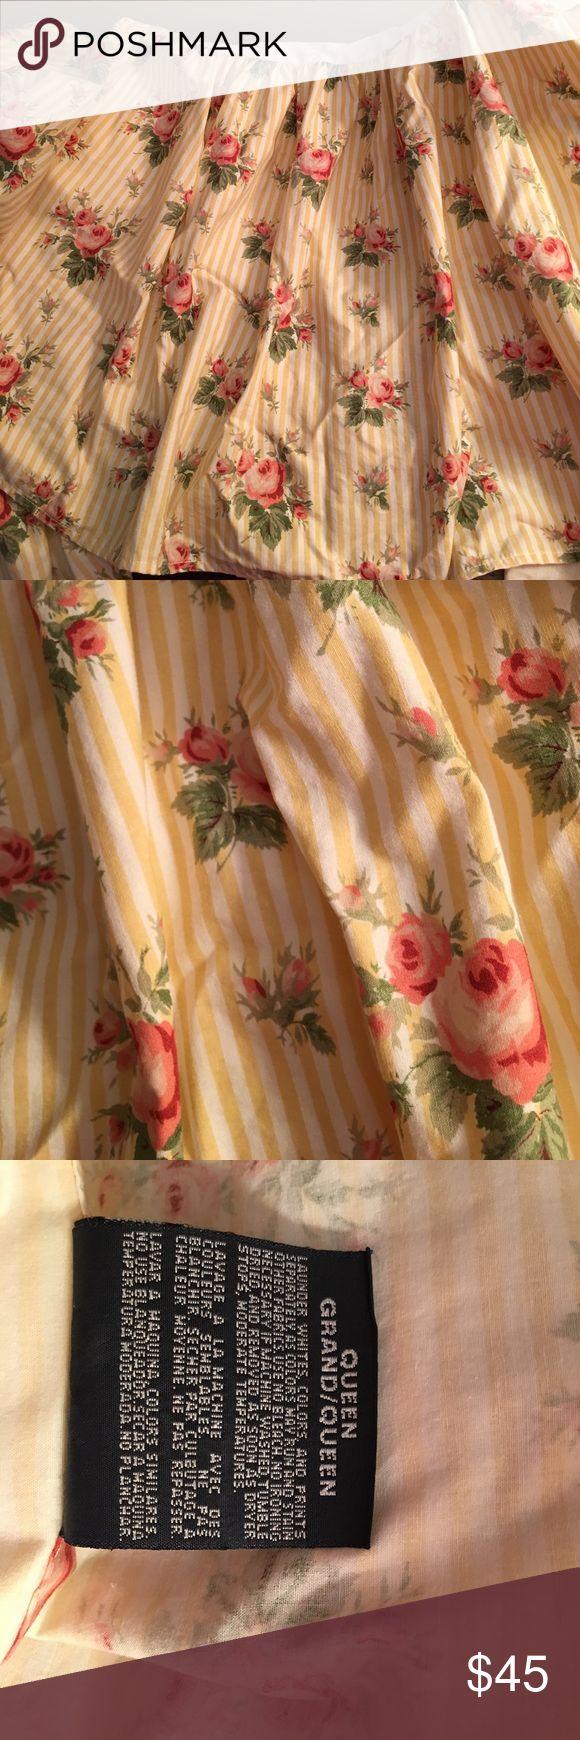 Ralph Lauren Queen Bed Skirt Beautiful Ralph Lauren Queen Size Bed Skirt. 100% cotton. Will be posting coordinating sheets and pillow cases. 🛍💕🌸🌺💐 Ralph Lauren Other